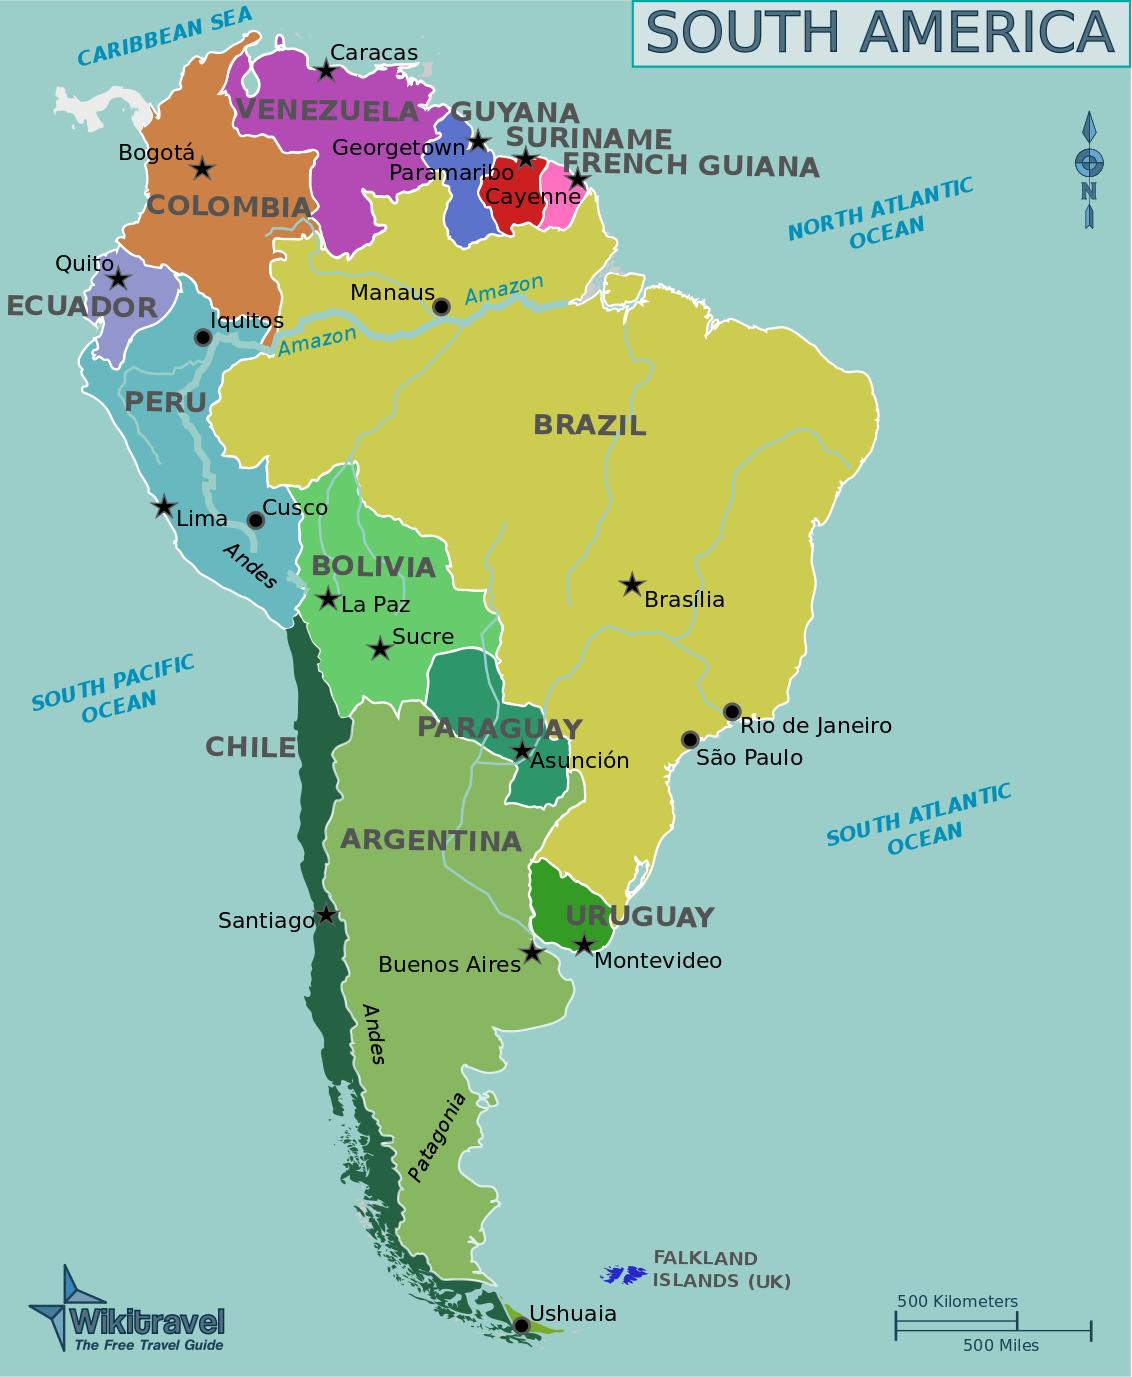 weltkarte südamerika Landkarte Südamerika (Politische Karte, englische Namen  weltkarte südamerika